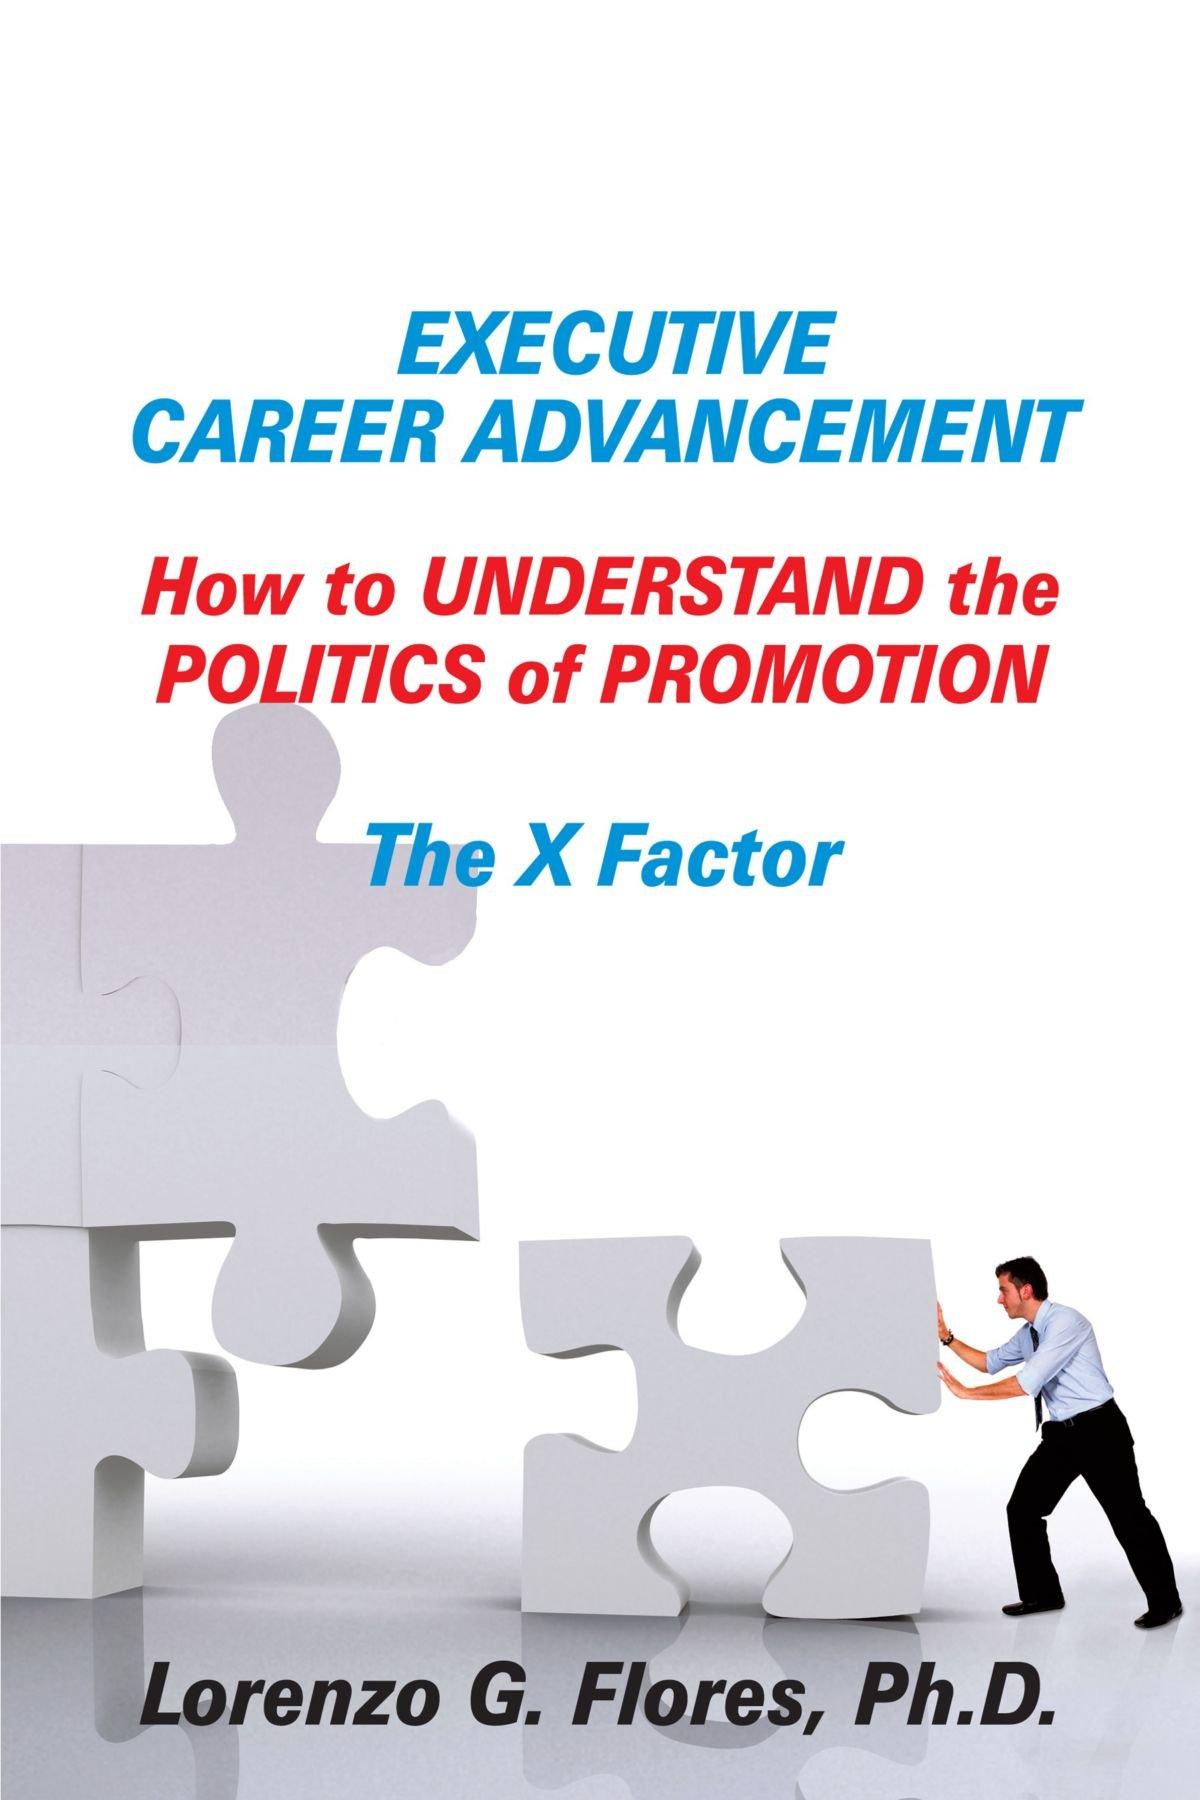 executive career advancement how to understand the politics of executive career advancement how to understand the politics of promotion the x factor ph d lorenzo g flores 9781420807554 com books